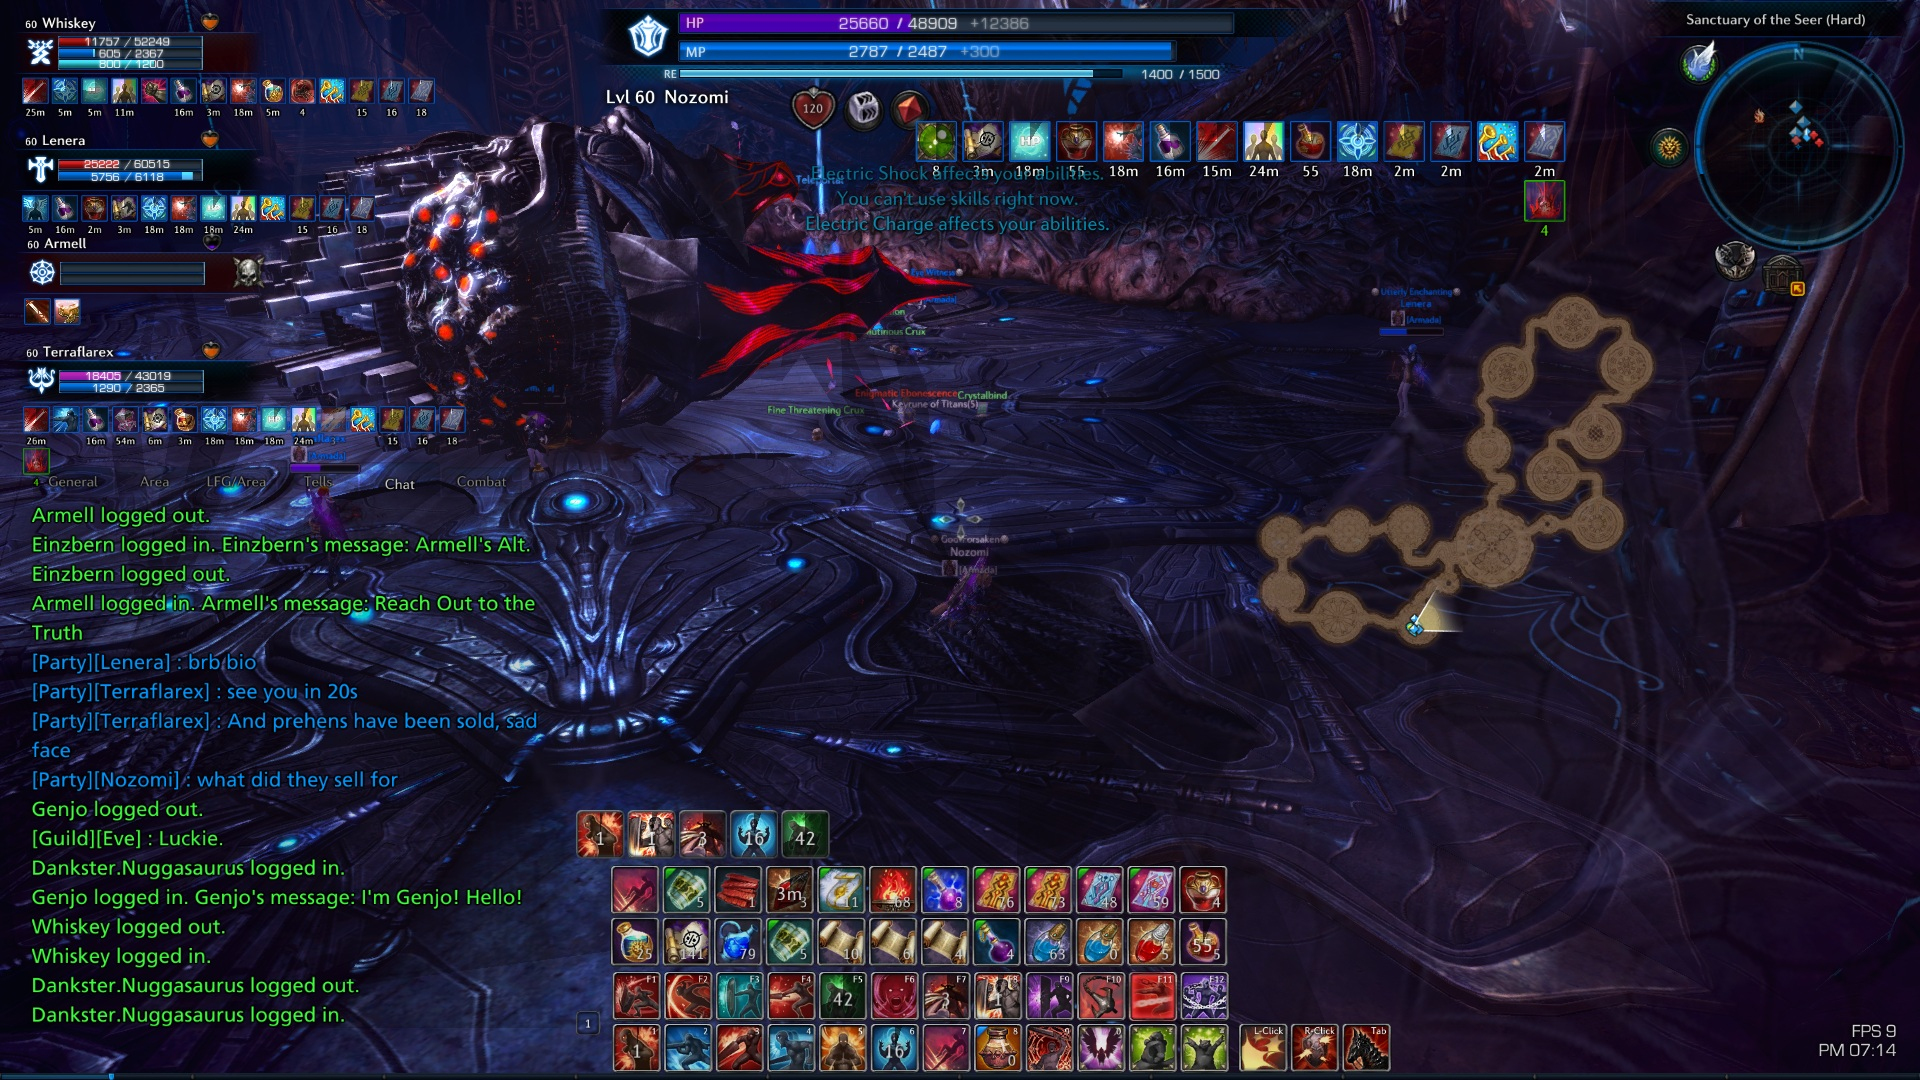 kipling games carried praetor secret recent accomplishment thread tera